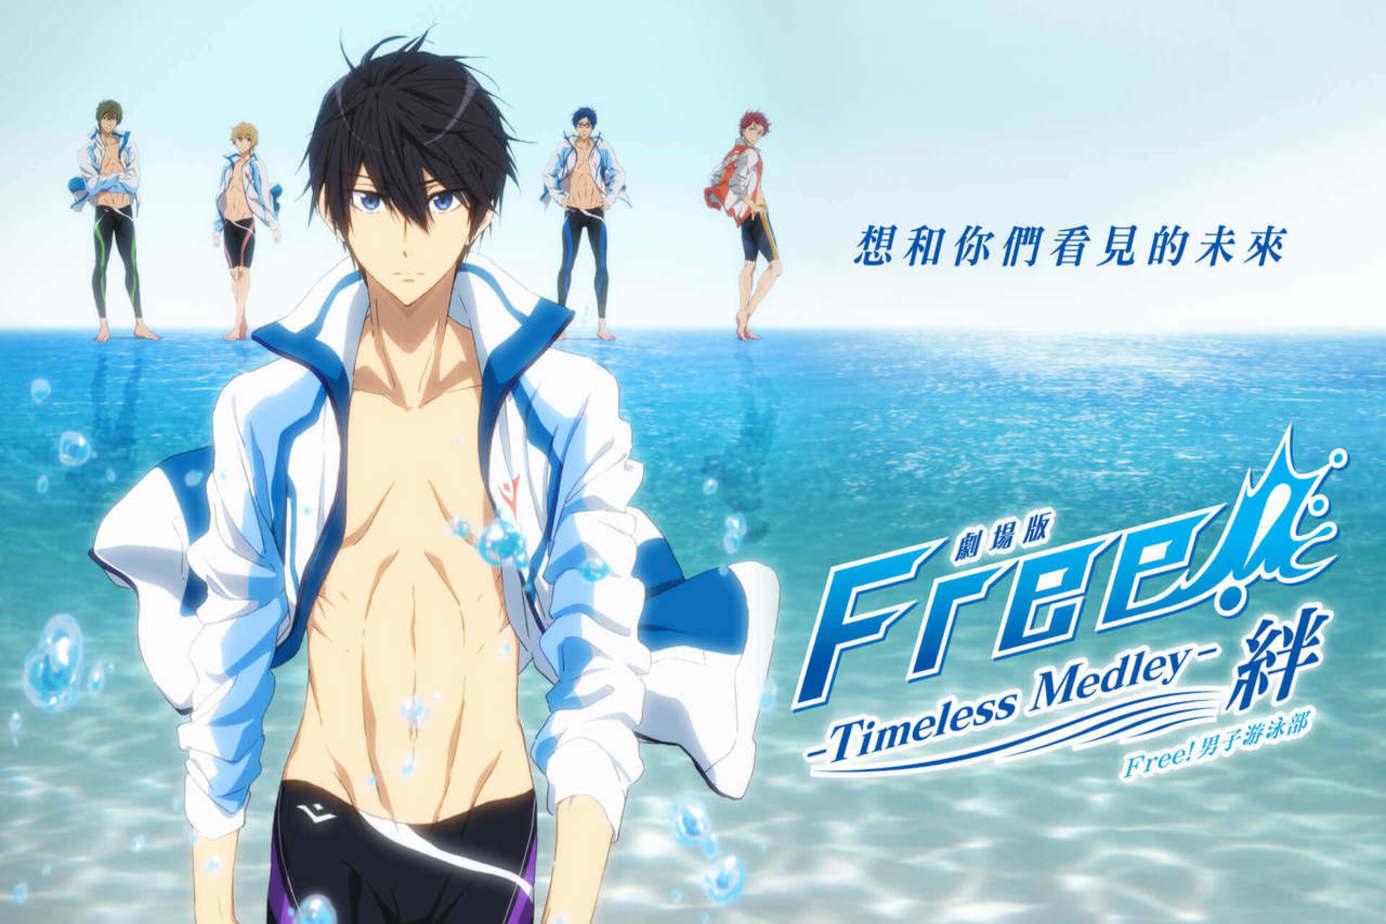 Free!/劇場版 -Timeless Medley-